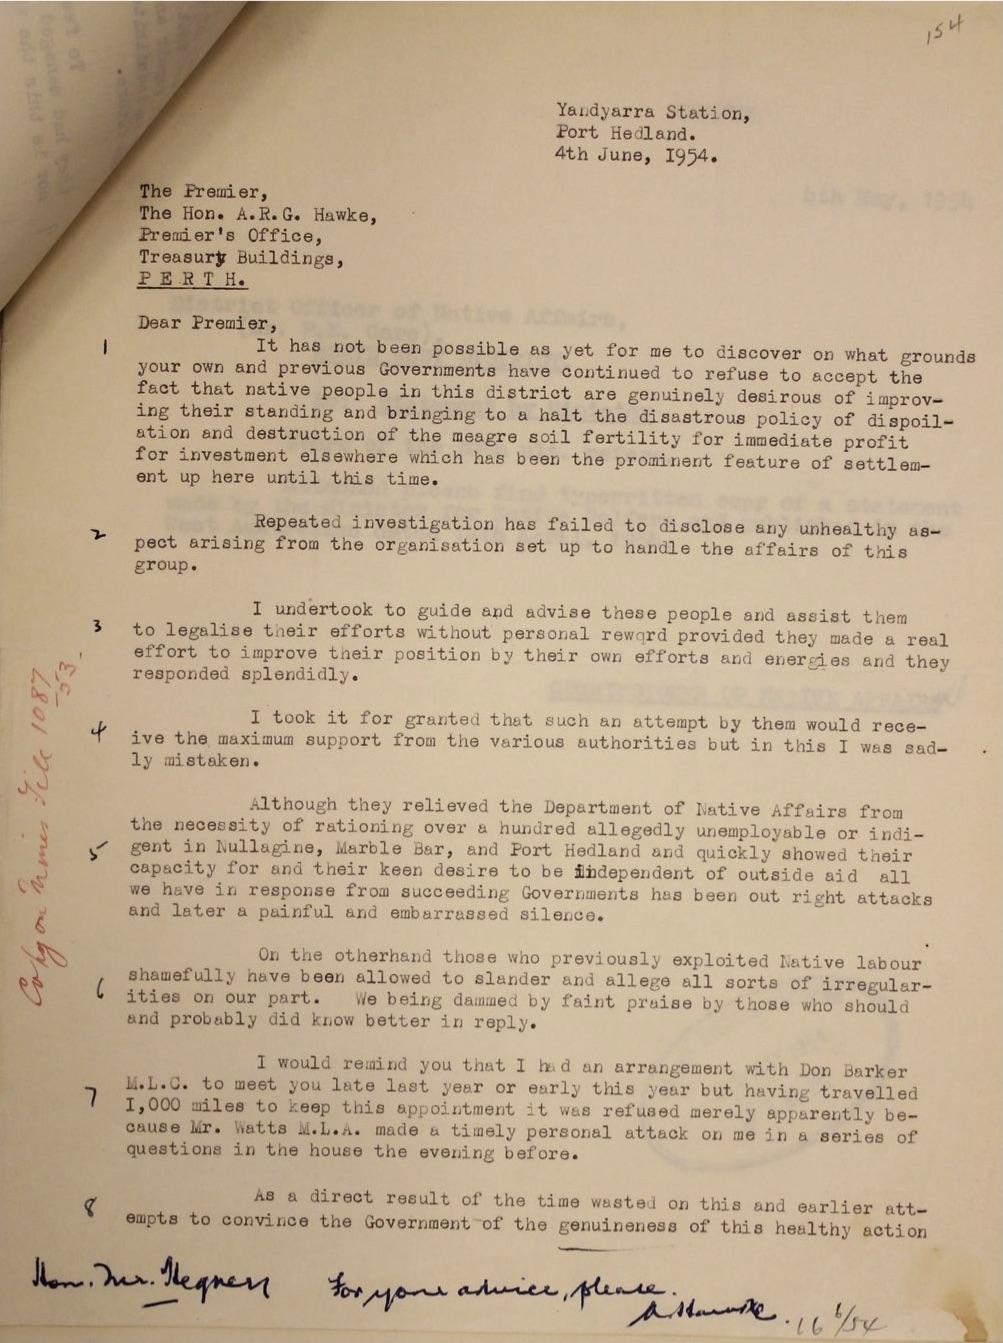 McLeod to Premier Hawke, 4 June 1954